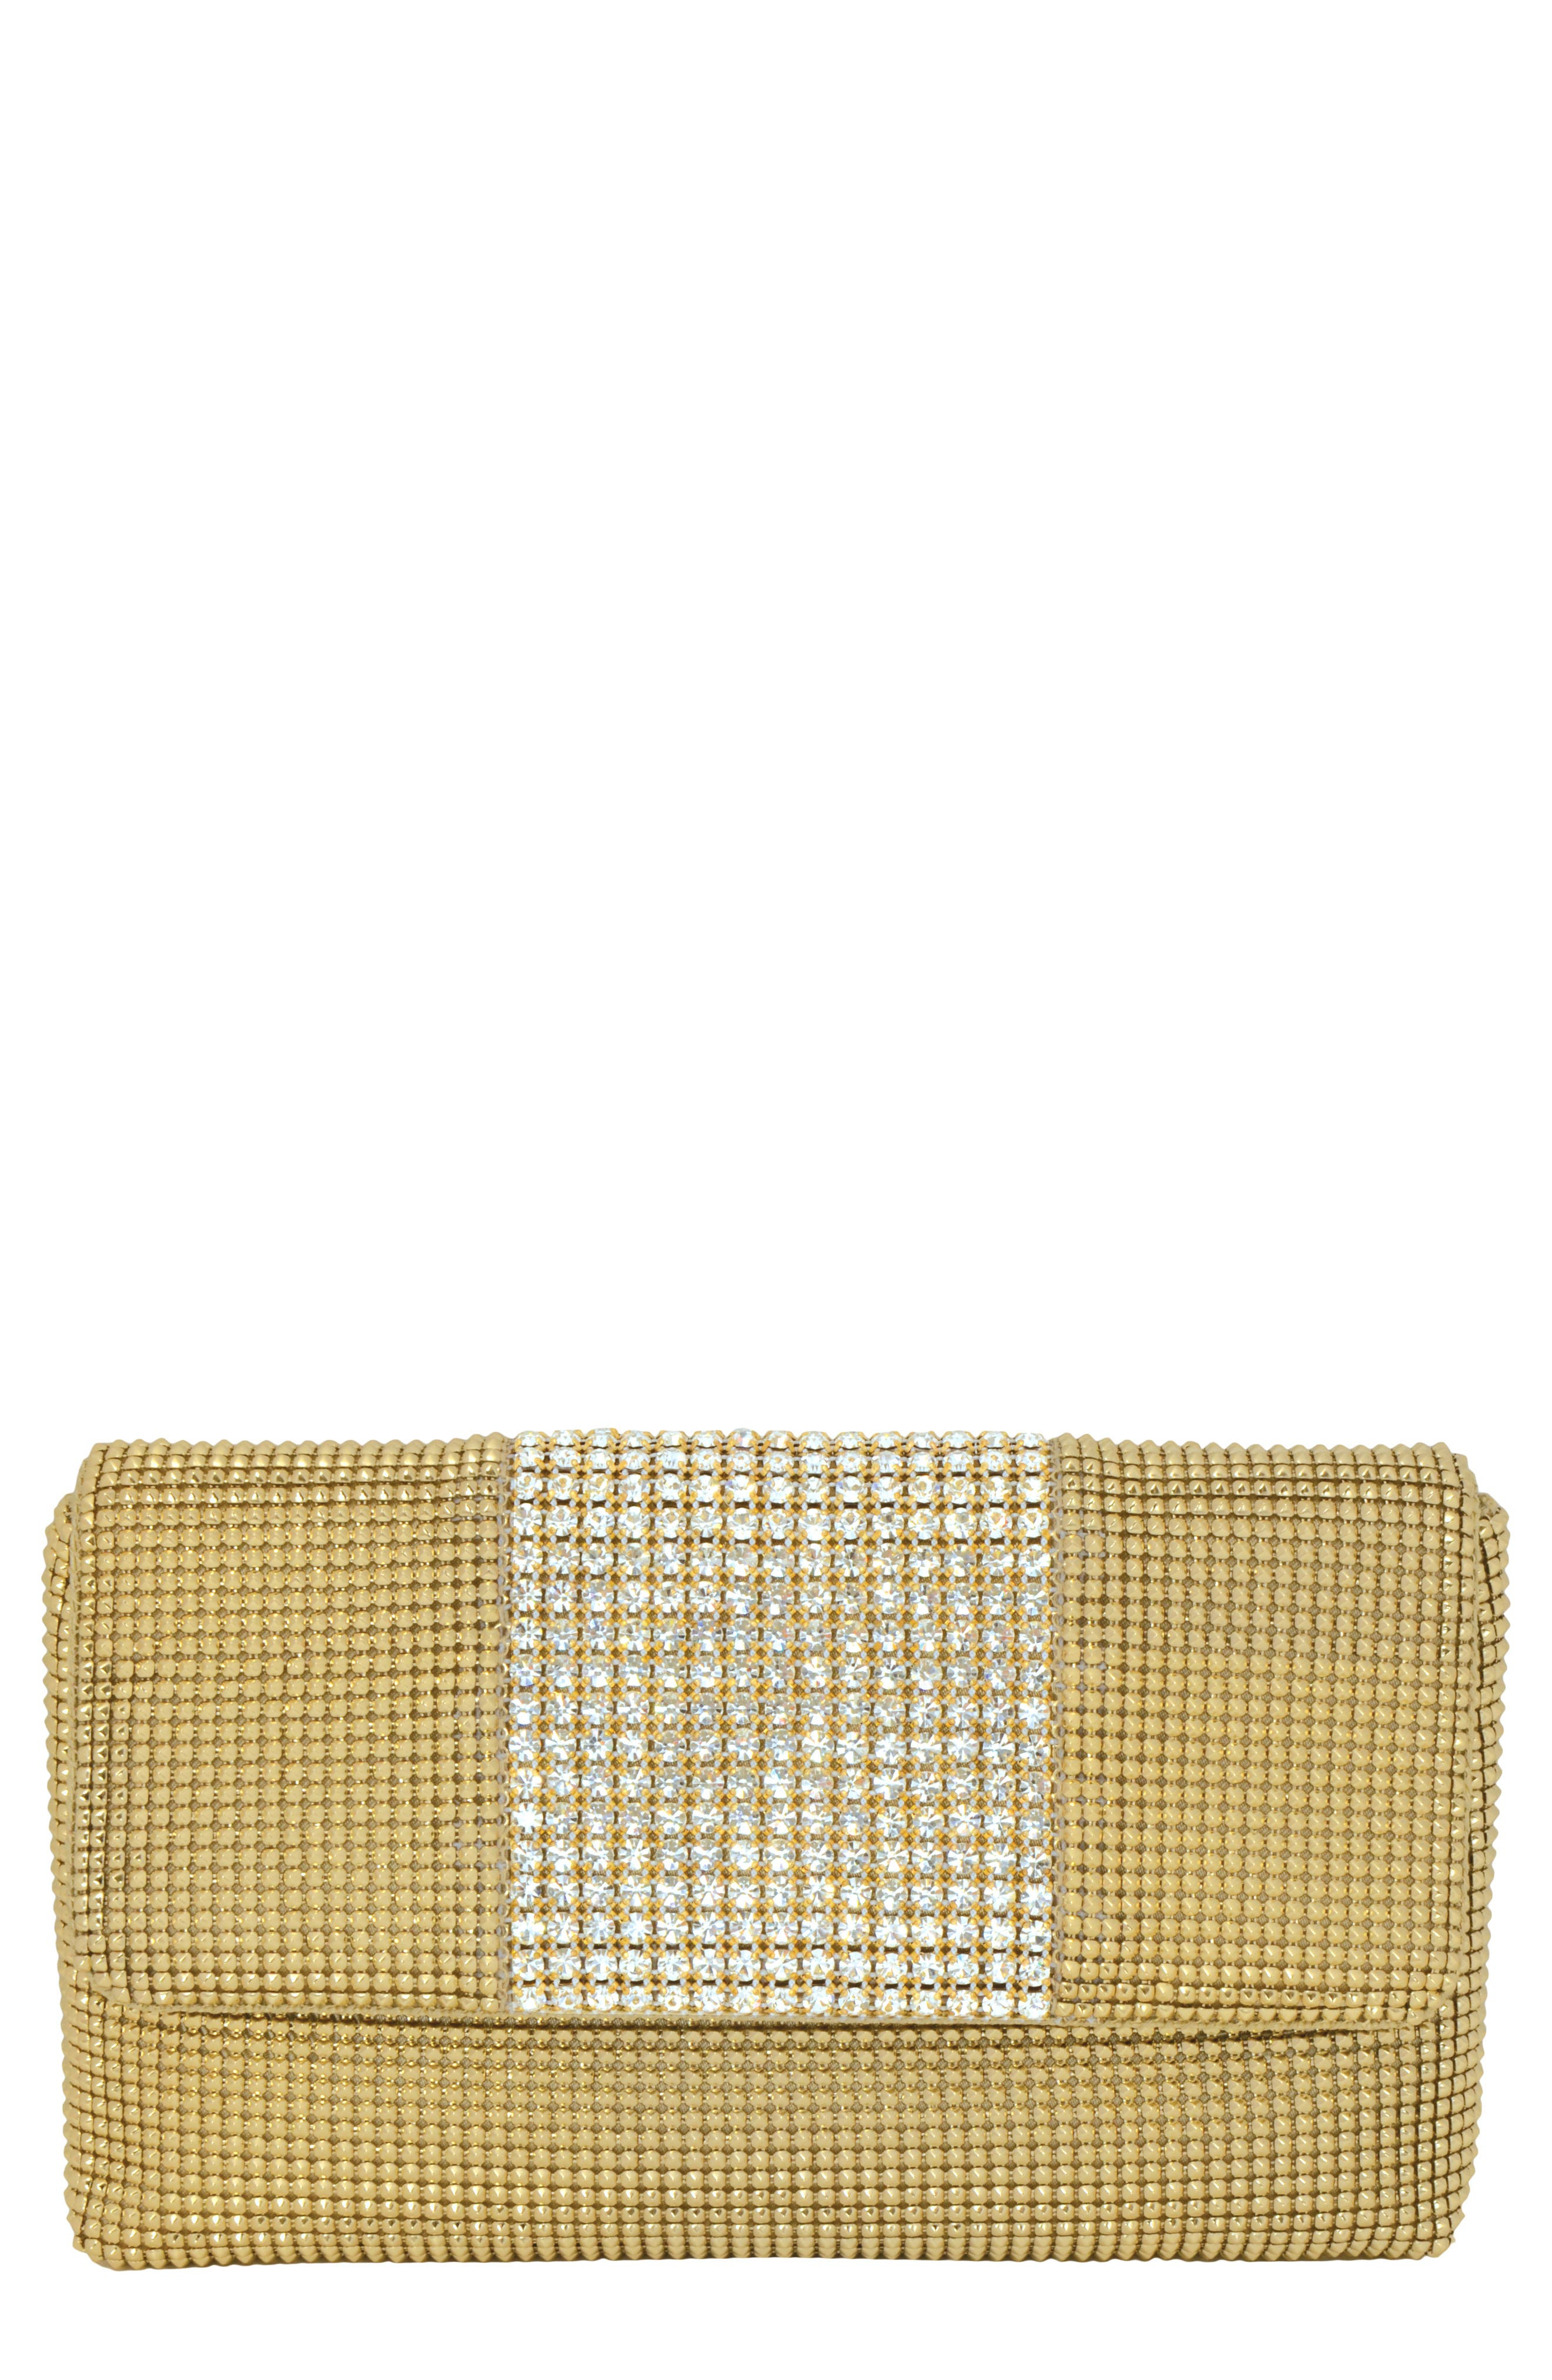 WHITING & DAVIS Rhinestone Stripe Metallic Mesh Flap Clutch - Metallic in Gold